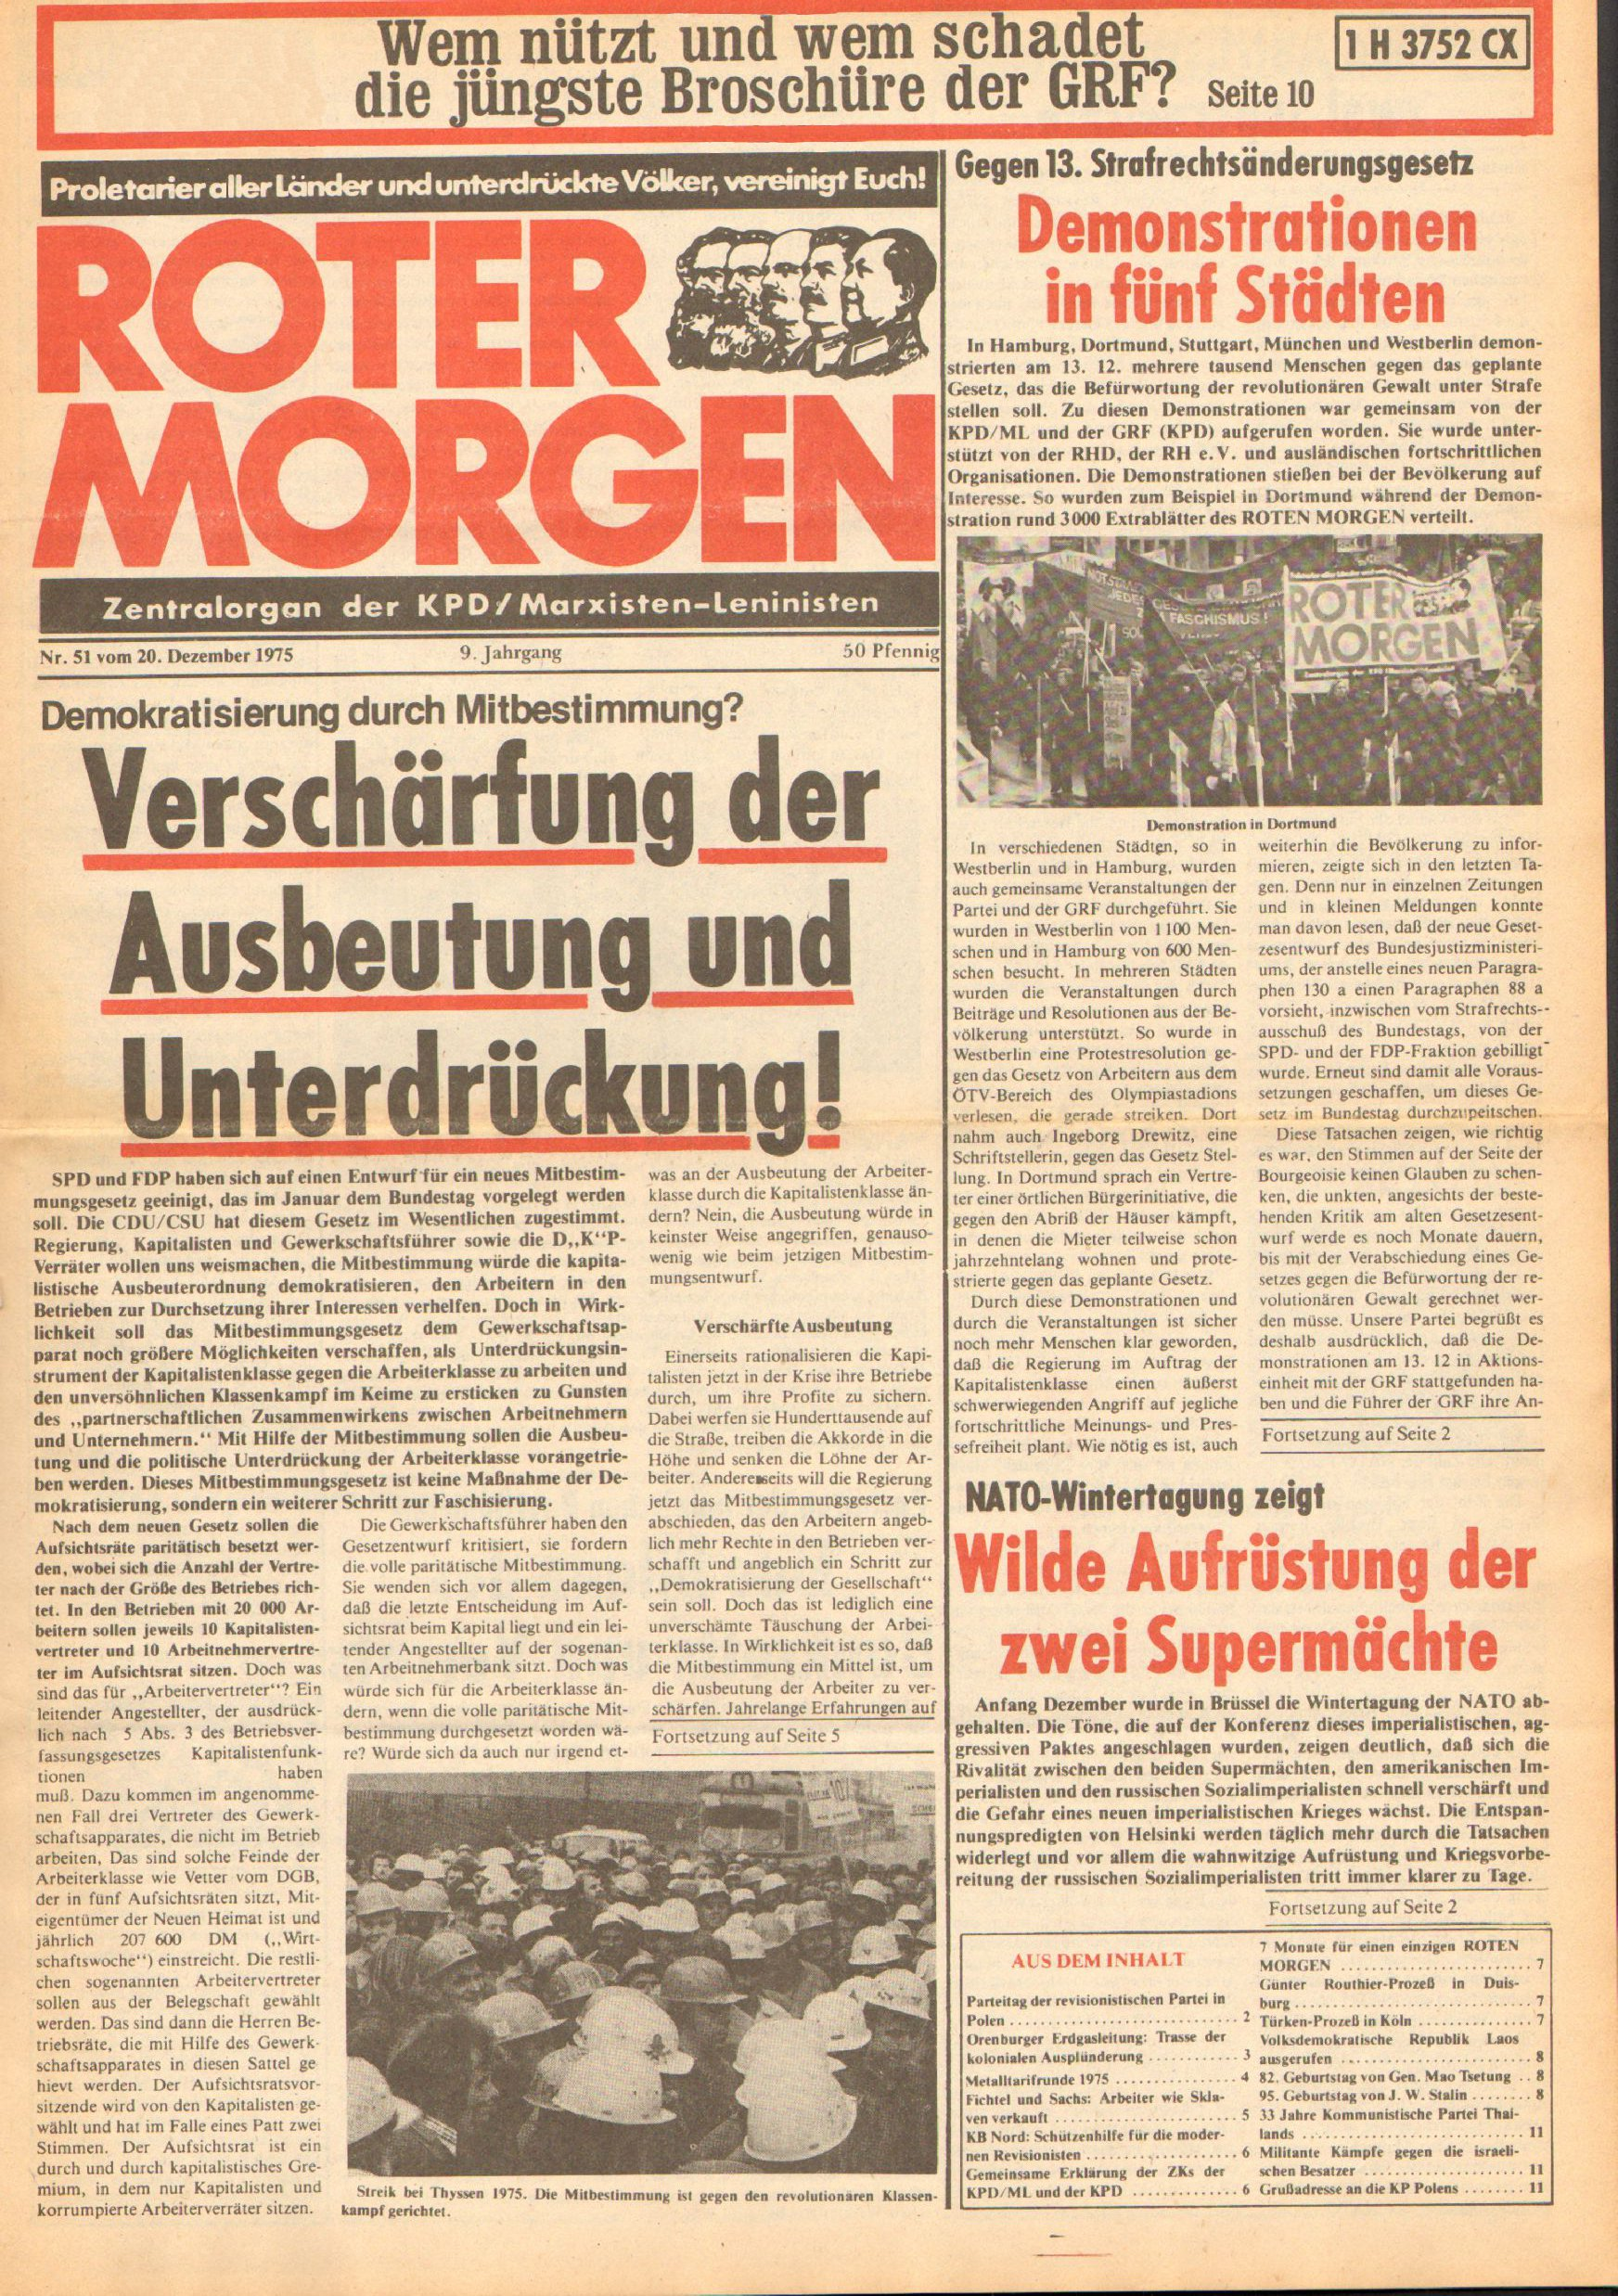 Roter Morgen, 9. Jg., 20. Dezember 1975, Nr. 51, Seite 1